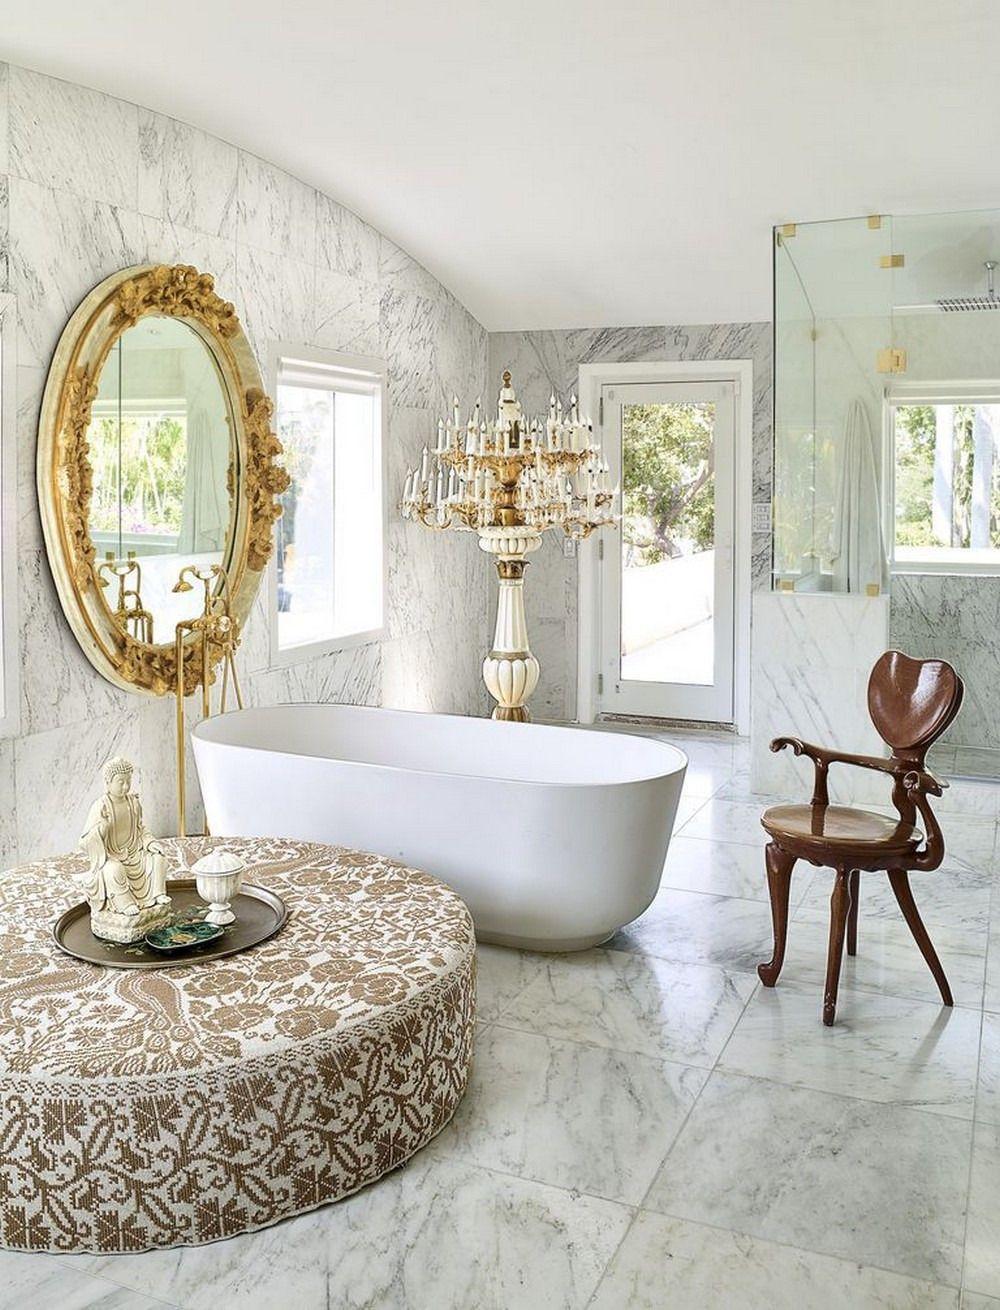 Elle Decor Bathrooms 2021 Best Bathroom Designs Beautiful Bathroom Designs Beautiful Bathrooms Elle decor best bathrooms